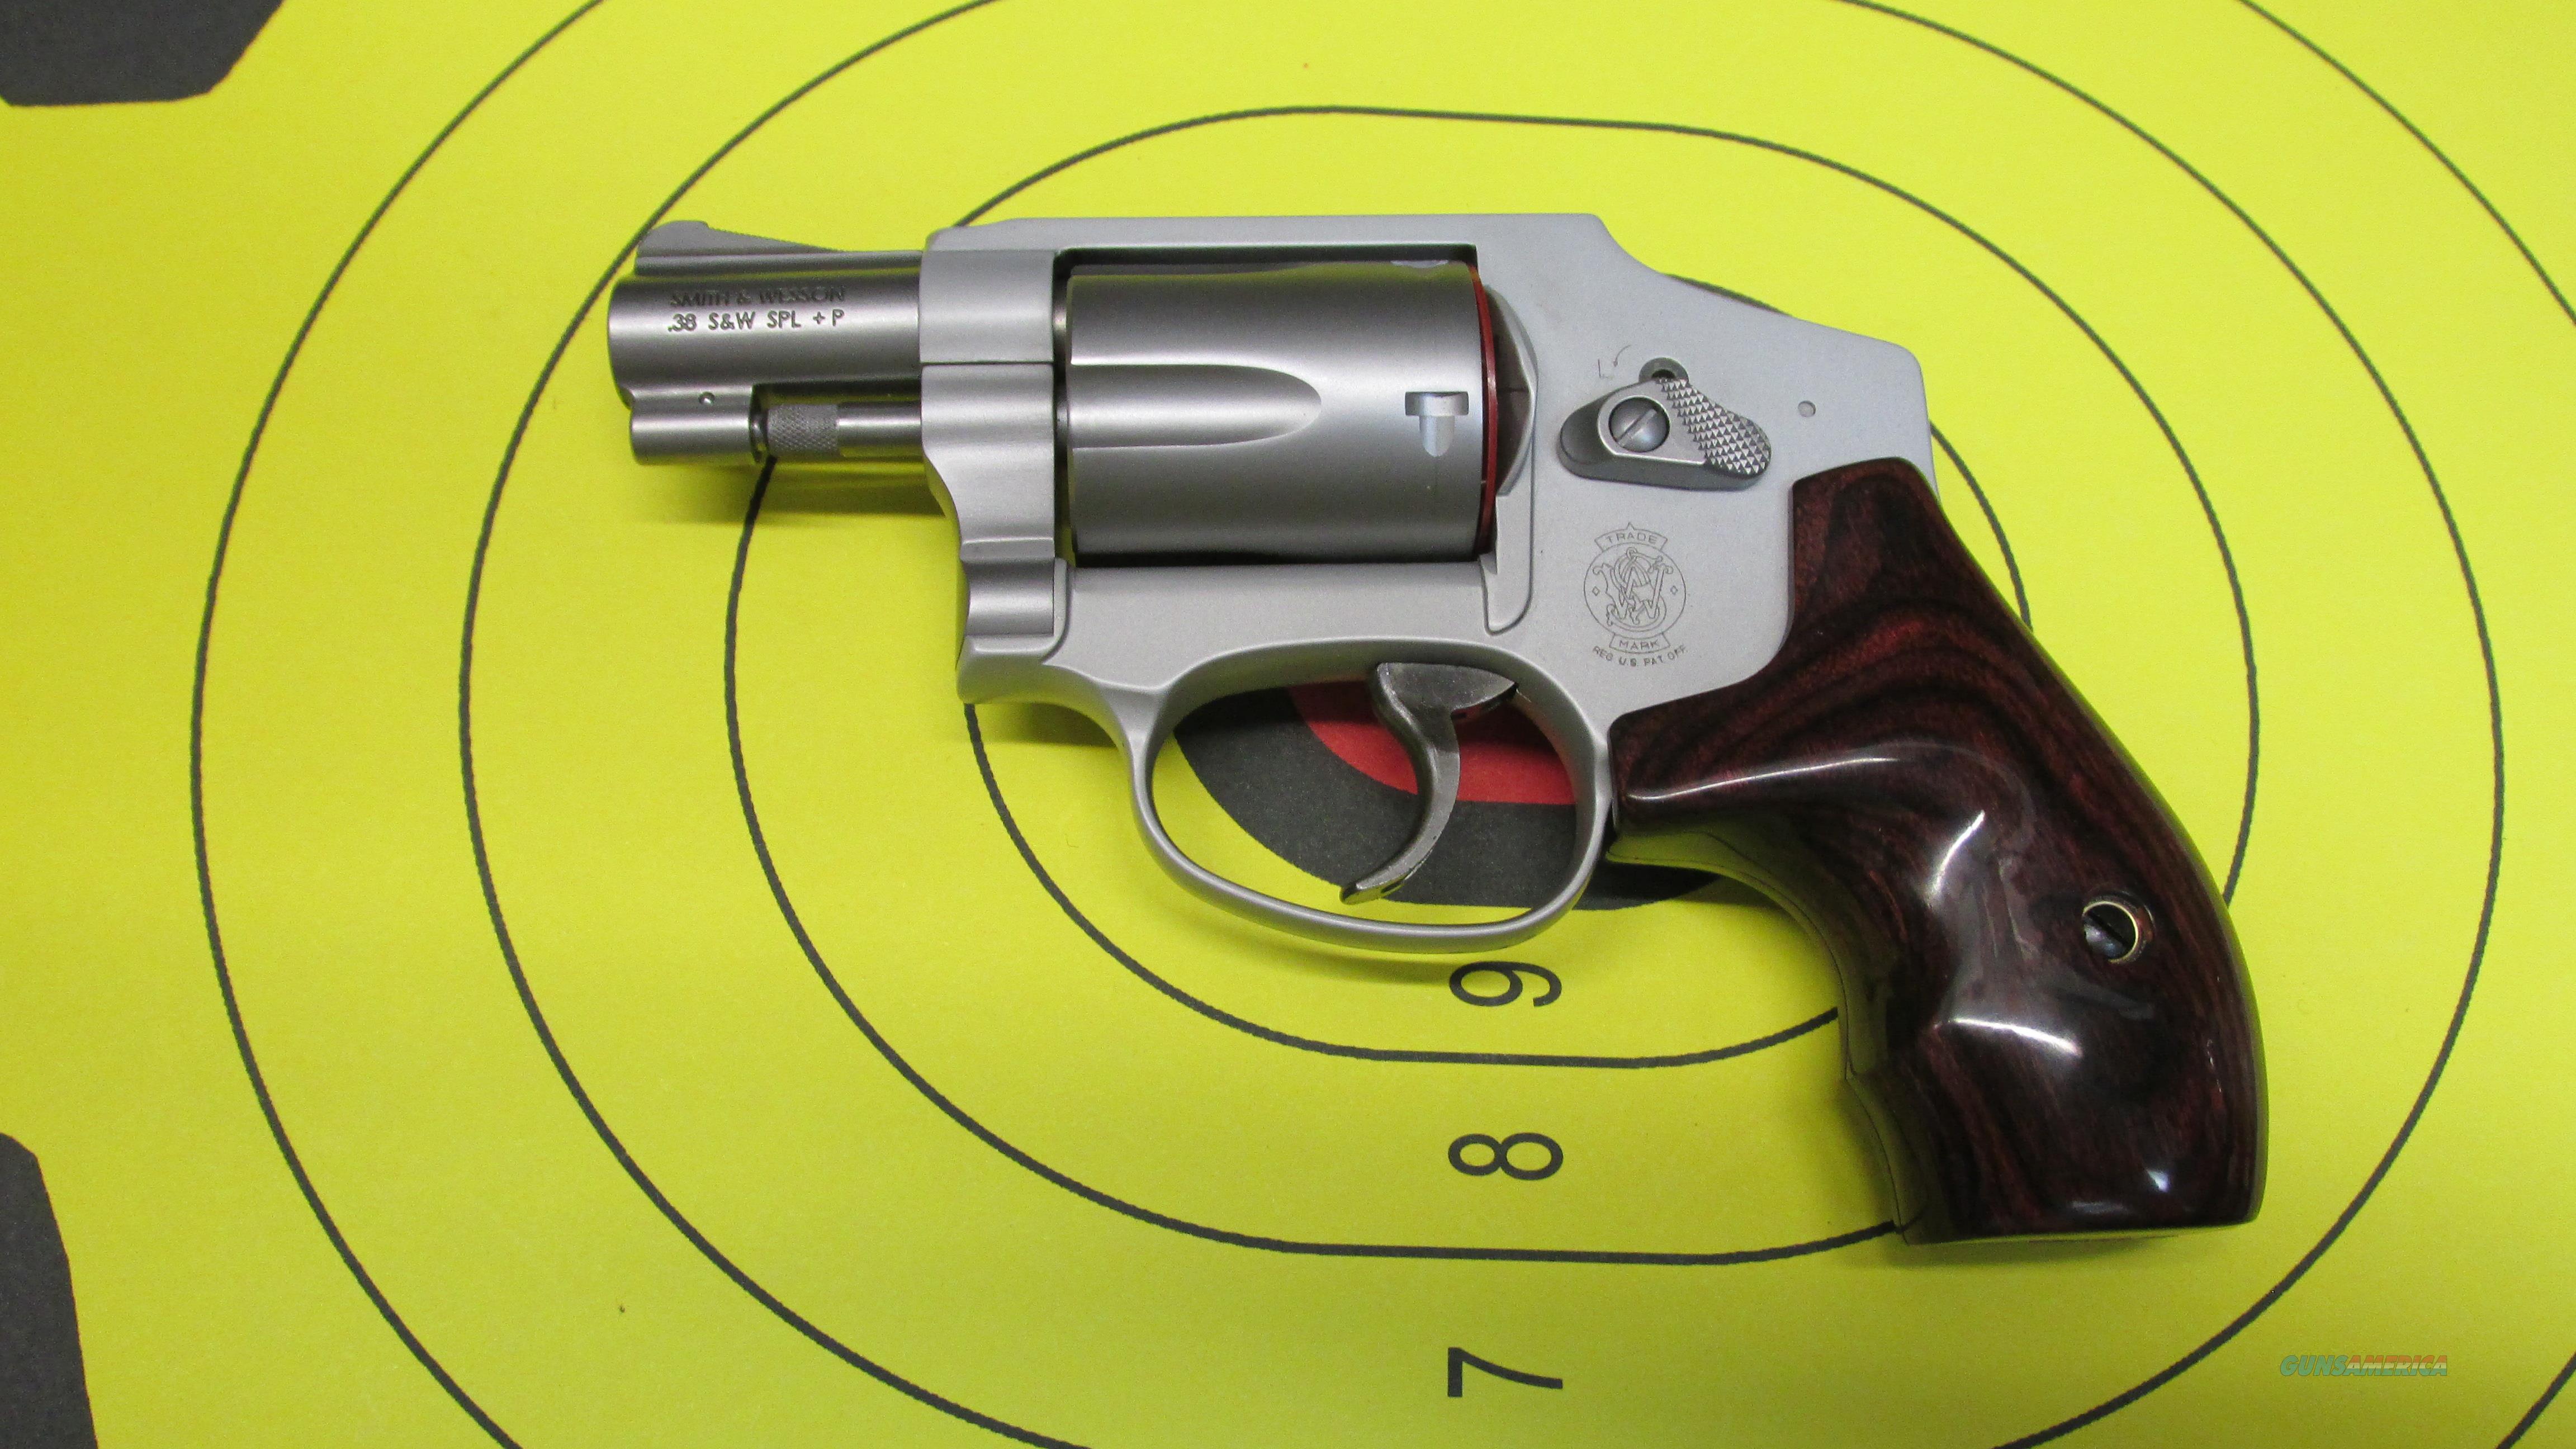 "SMITH &WESSON 642-2 LADYSMITH .38 SPECIAL 5 SHOT REVOLVER, 1.875"" BARREL  Guns > Pistols > Smith & Wesson Revolvers > Small Frame ( J )"